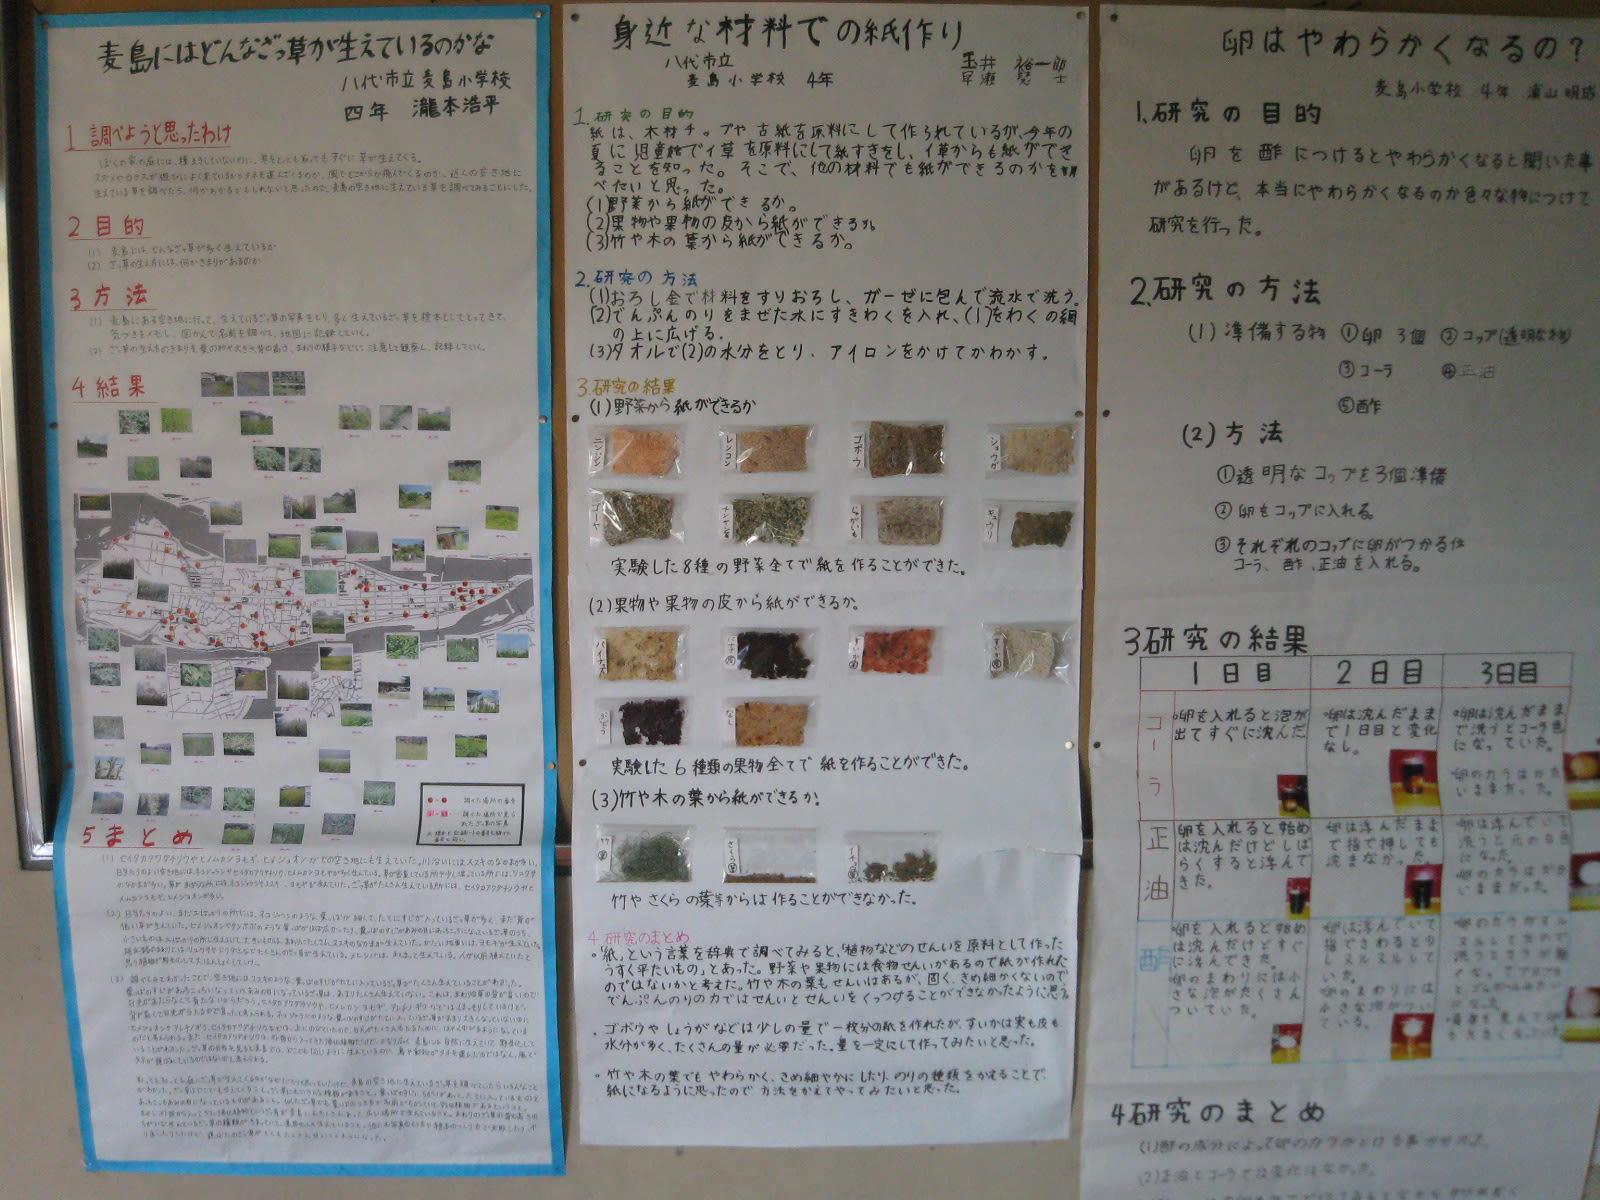 2011年9月のブログ記事一覧-八代 ... : 小学校 3 年 自由研究 : 小学校